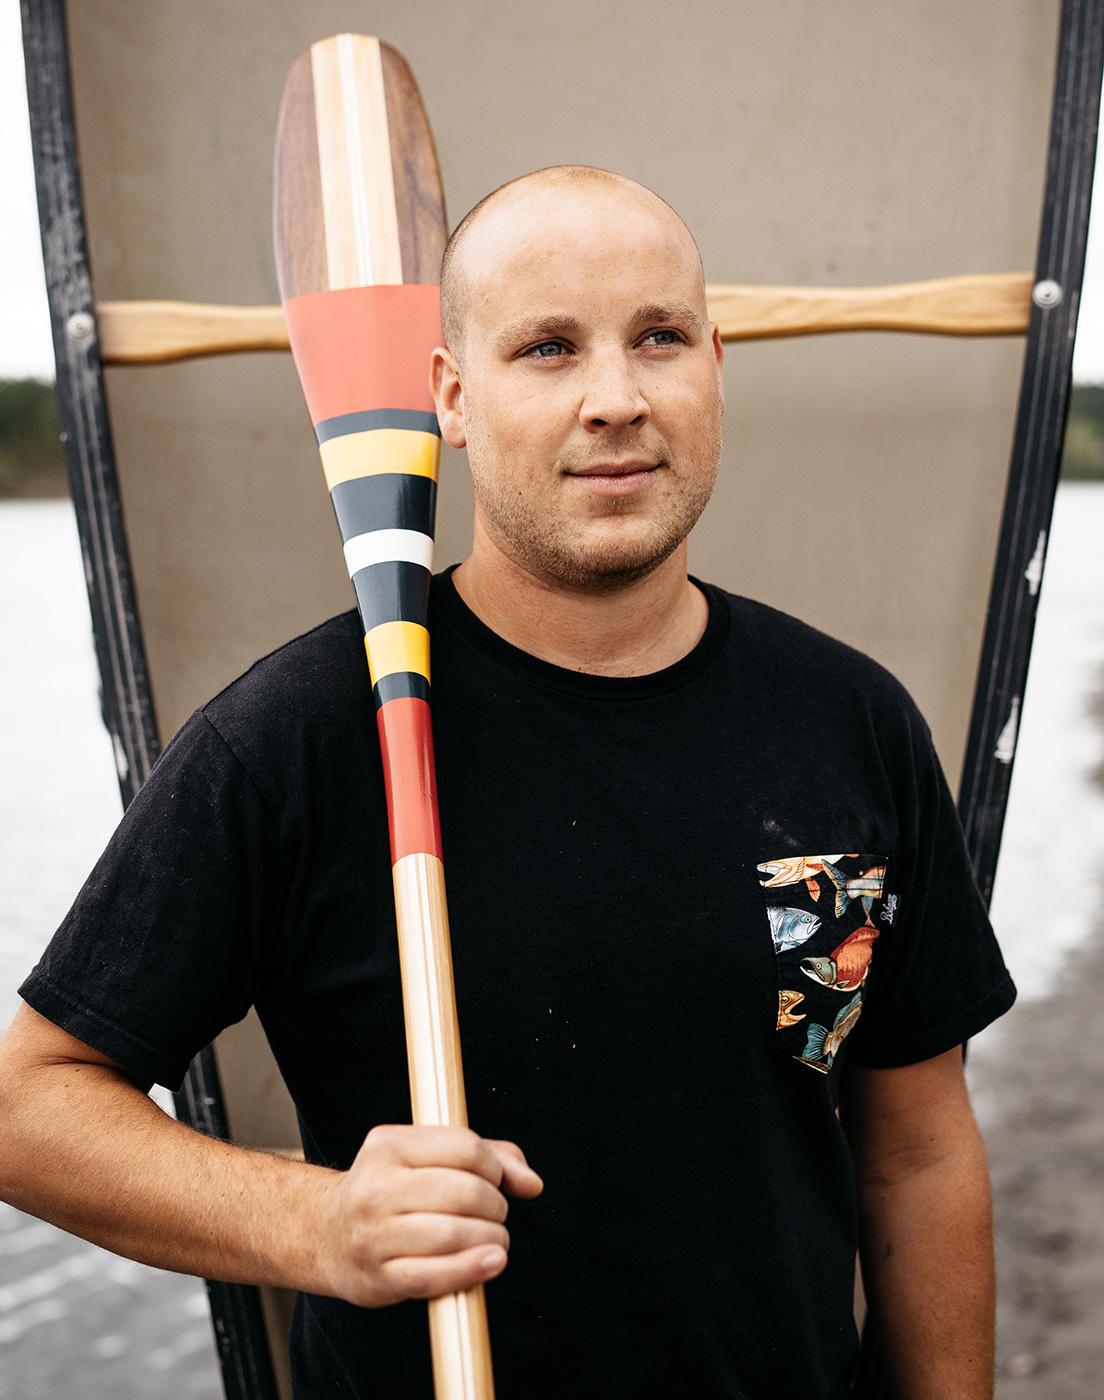 Conor-Kerr-Edmonton-Canoe-Portrait_4284-Full.jpg